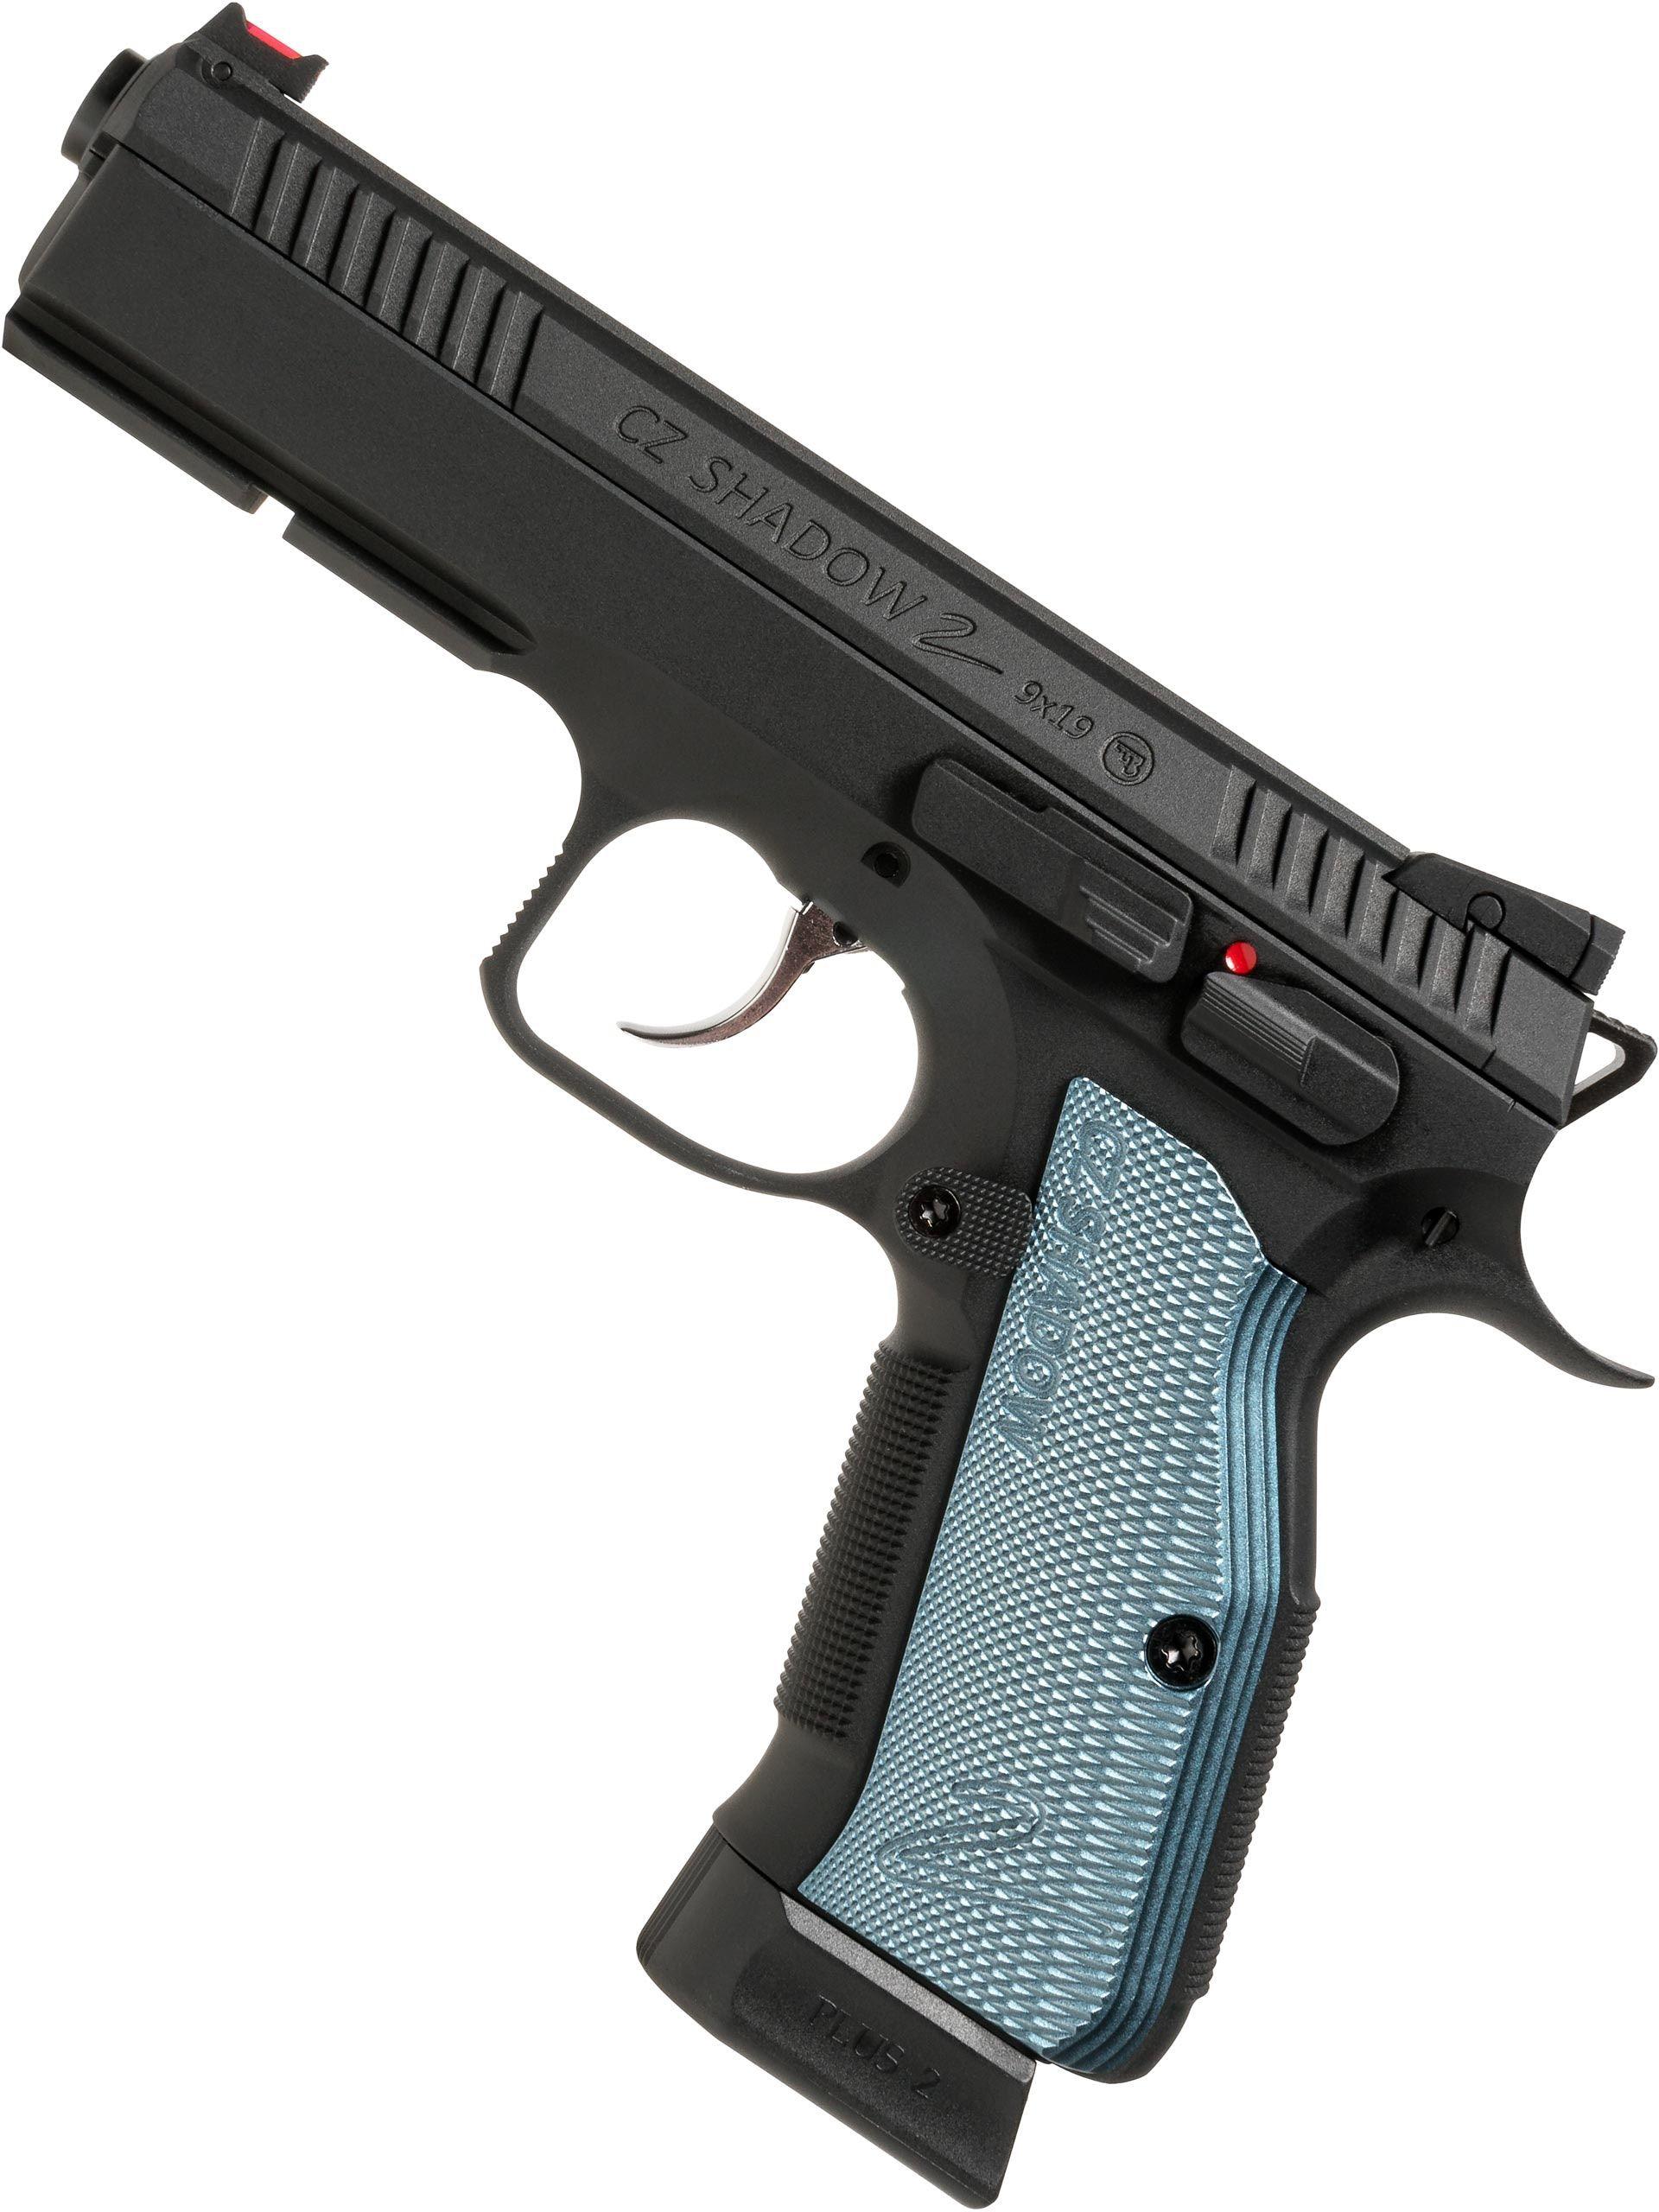 ASG CZ Shadow 2 CO2 Pistol, Black